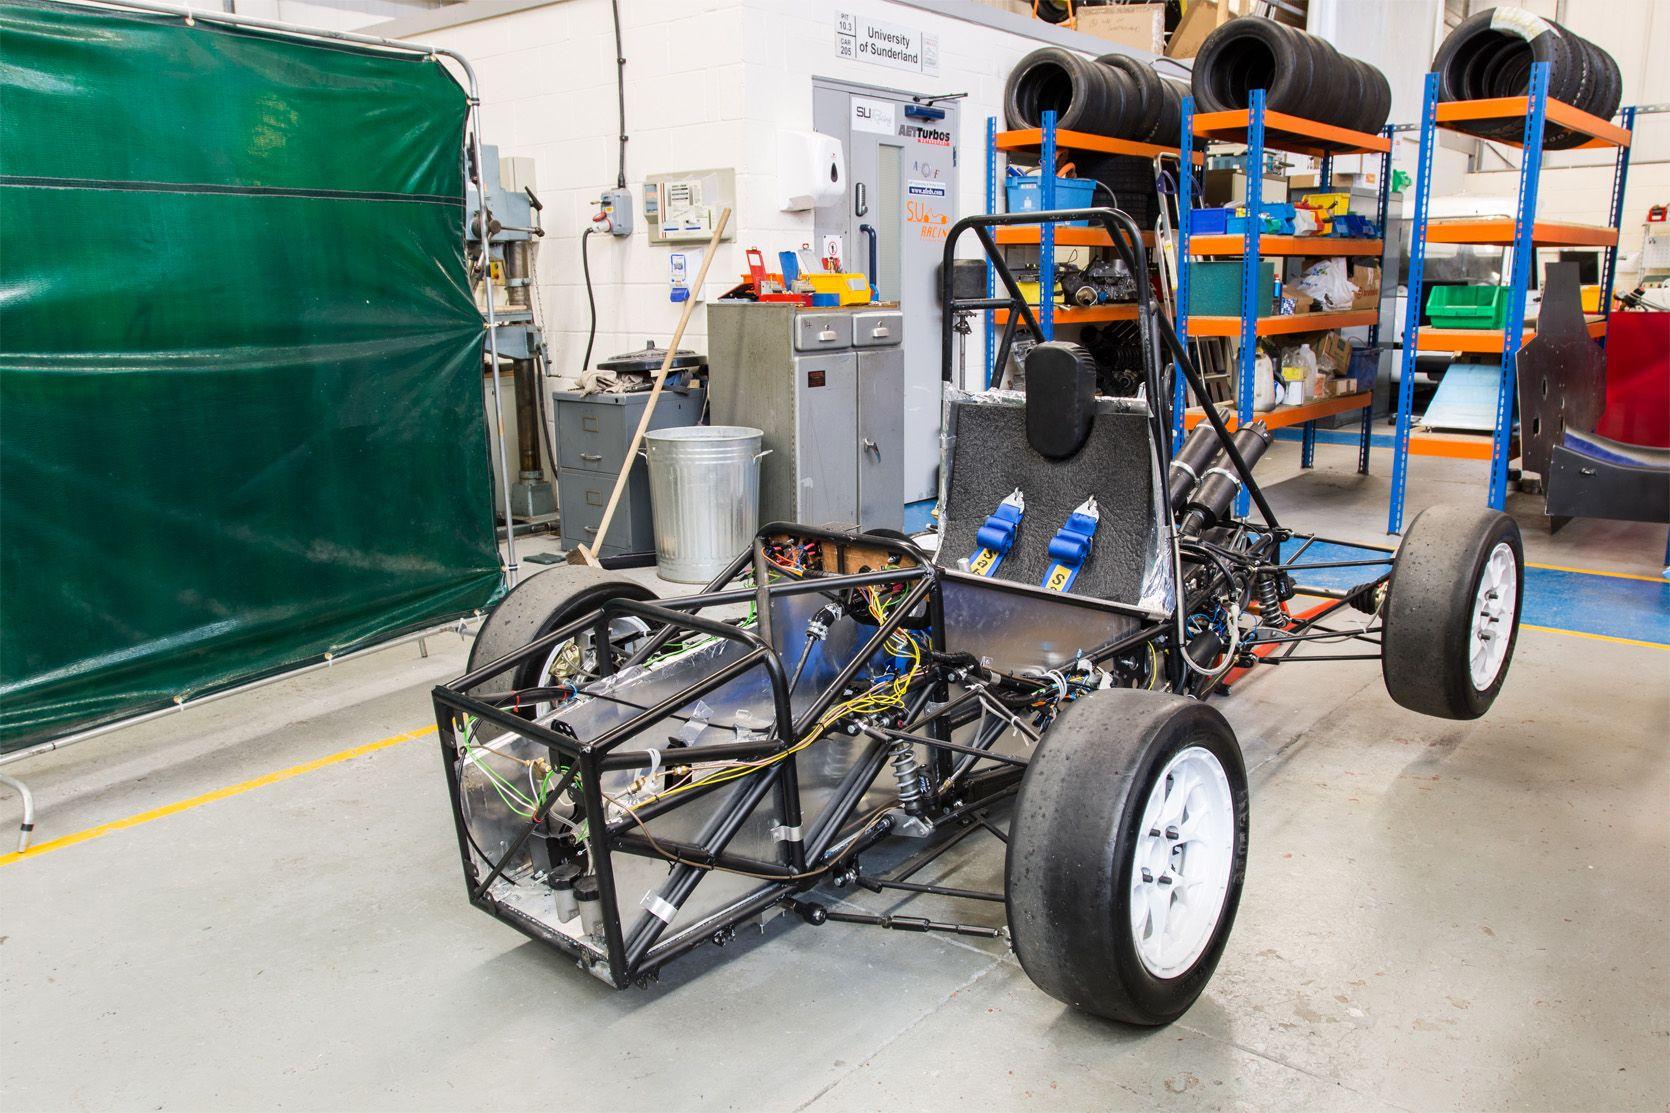 Formula student car chassis